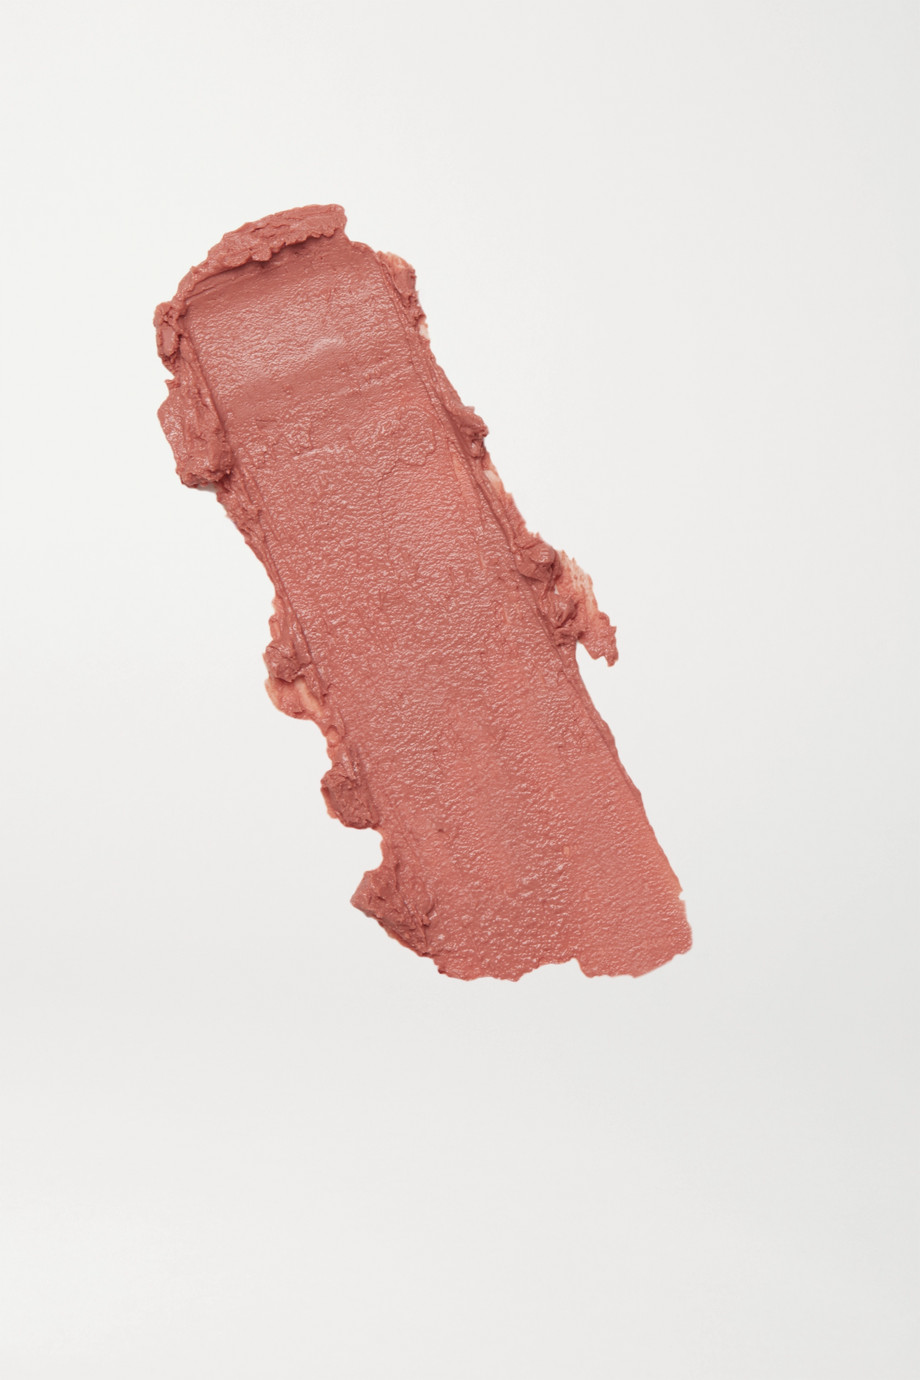 Kjaer Weis Lip Tint Refill - Dream State